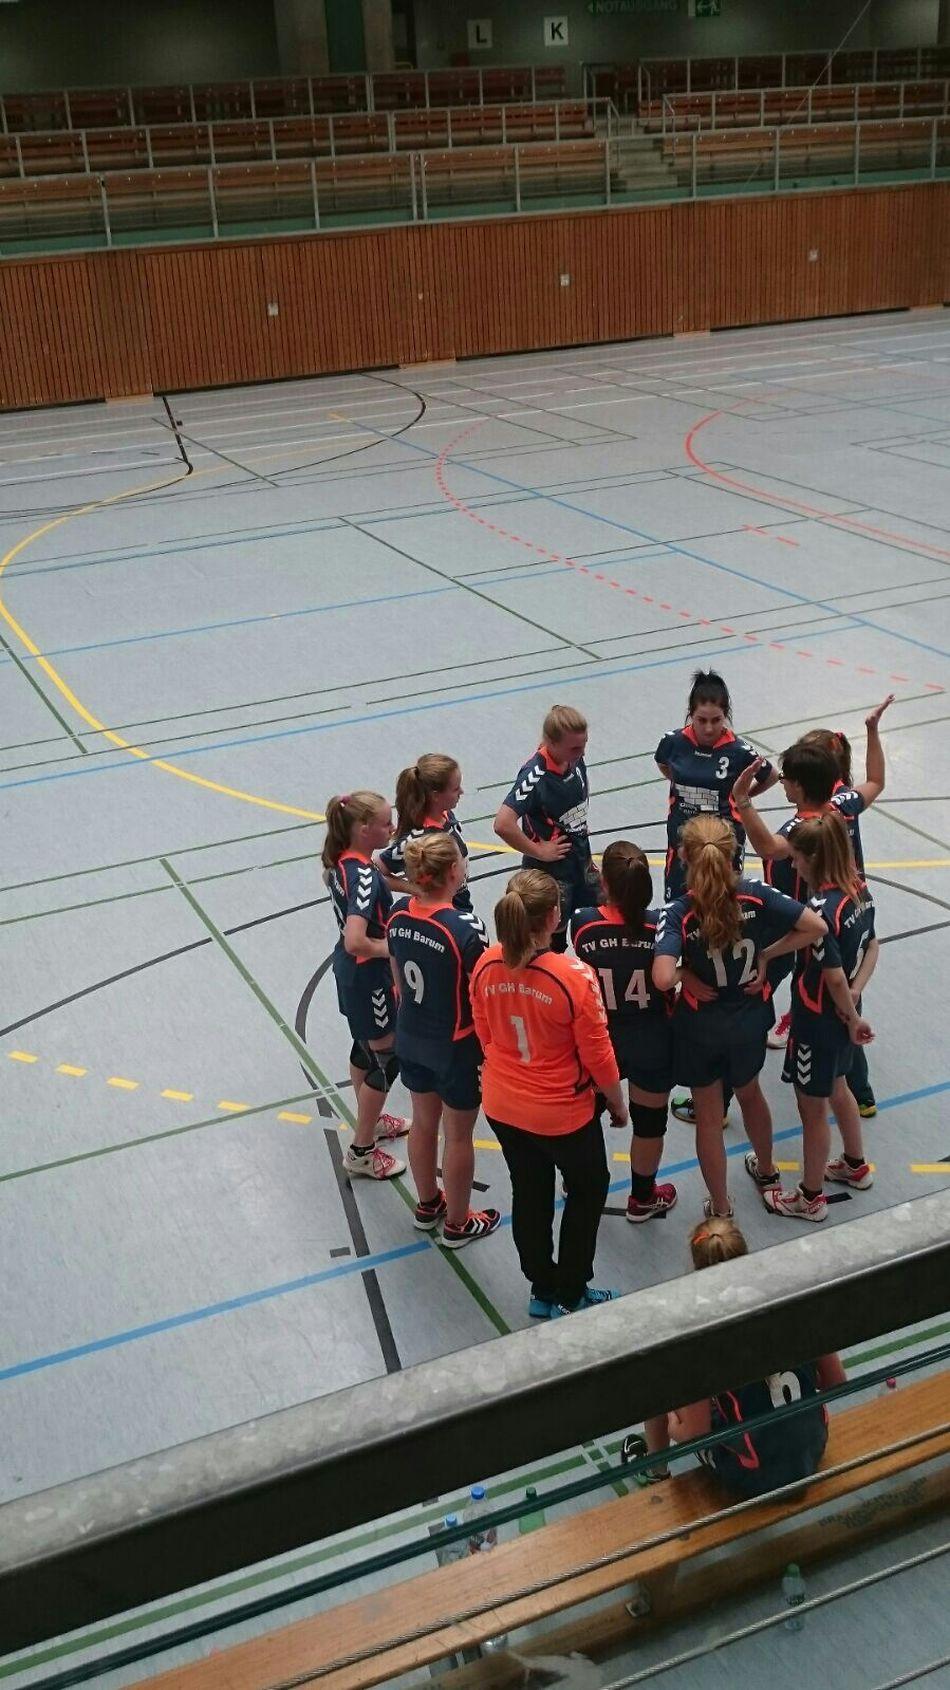 Bestfriend Picoftheday People Taking Pictures Memories Liebe Taking Photos Barum Sieg Handball